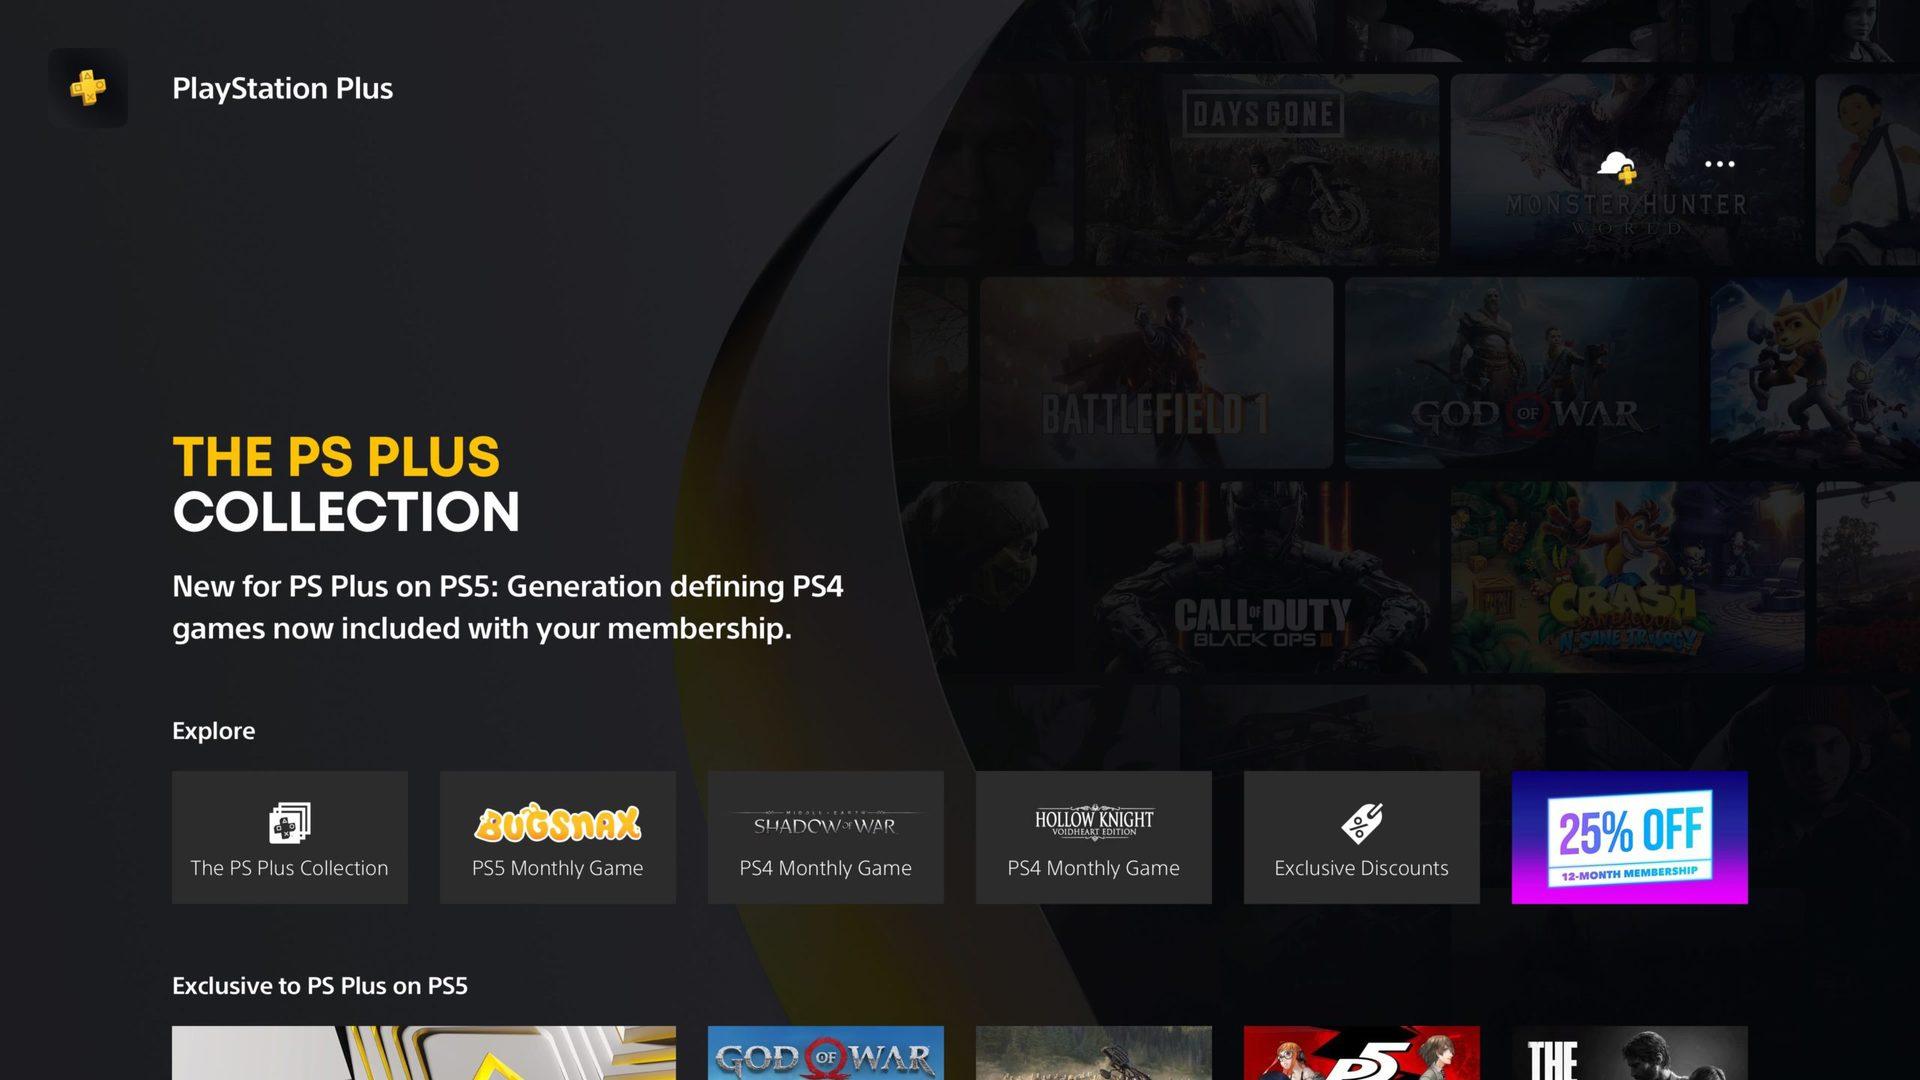 ps plus subscription page